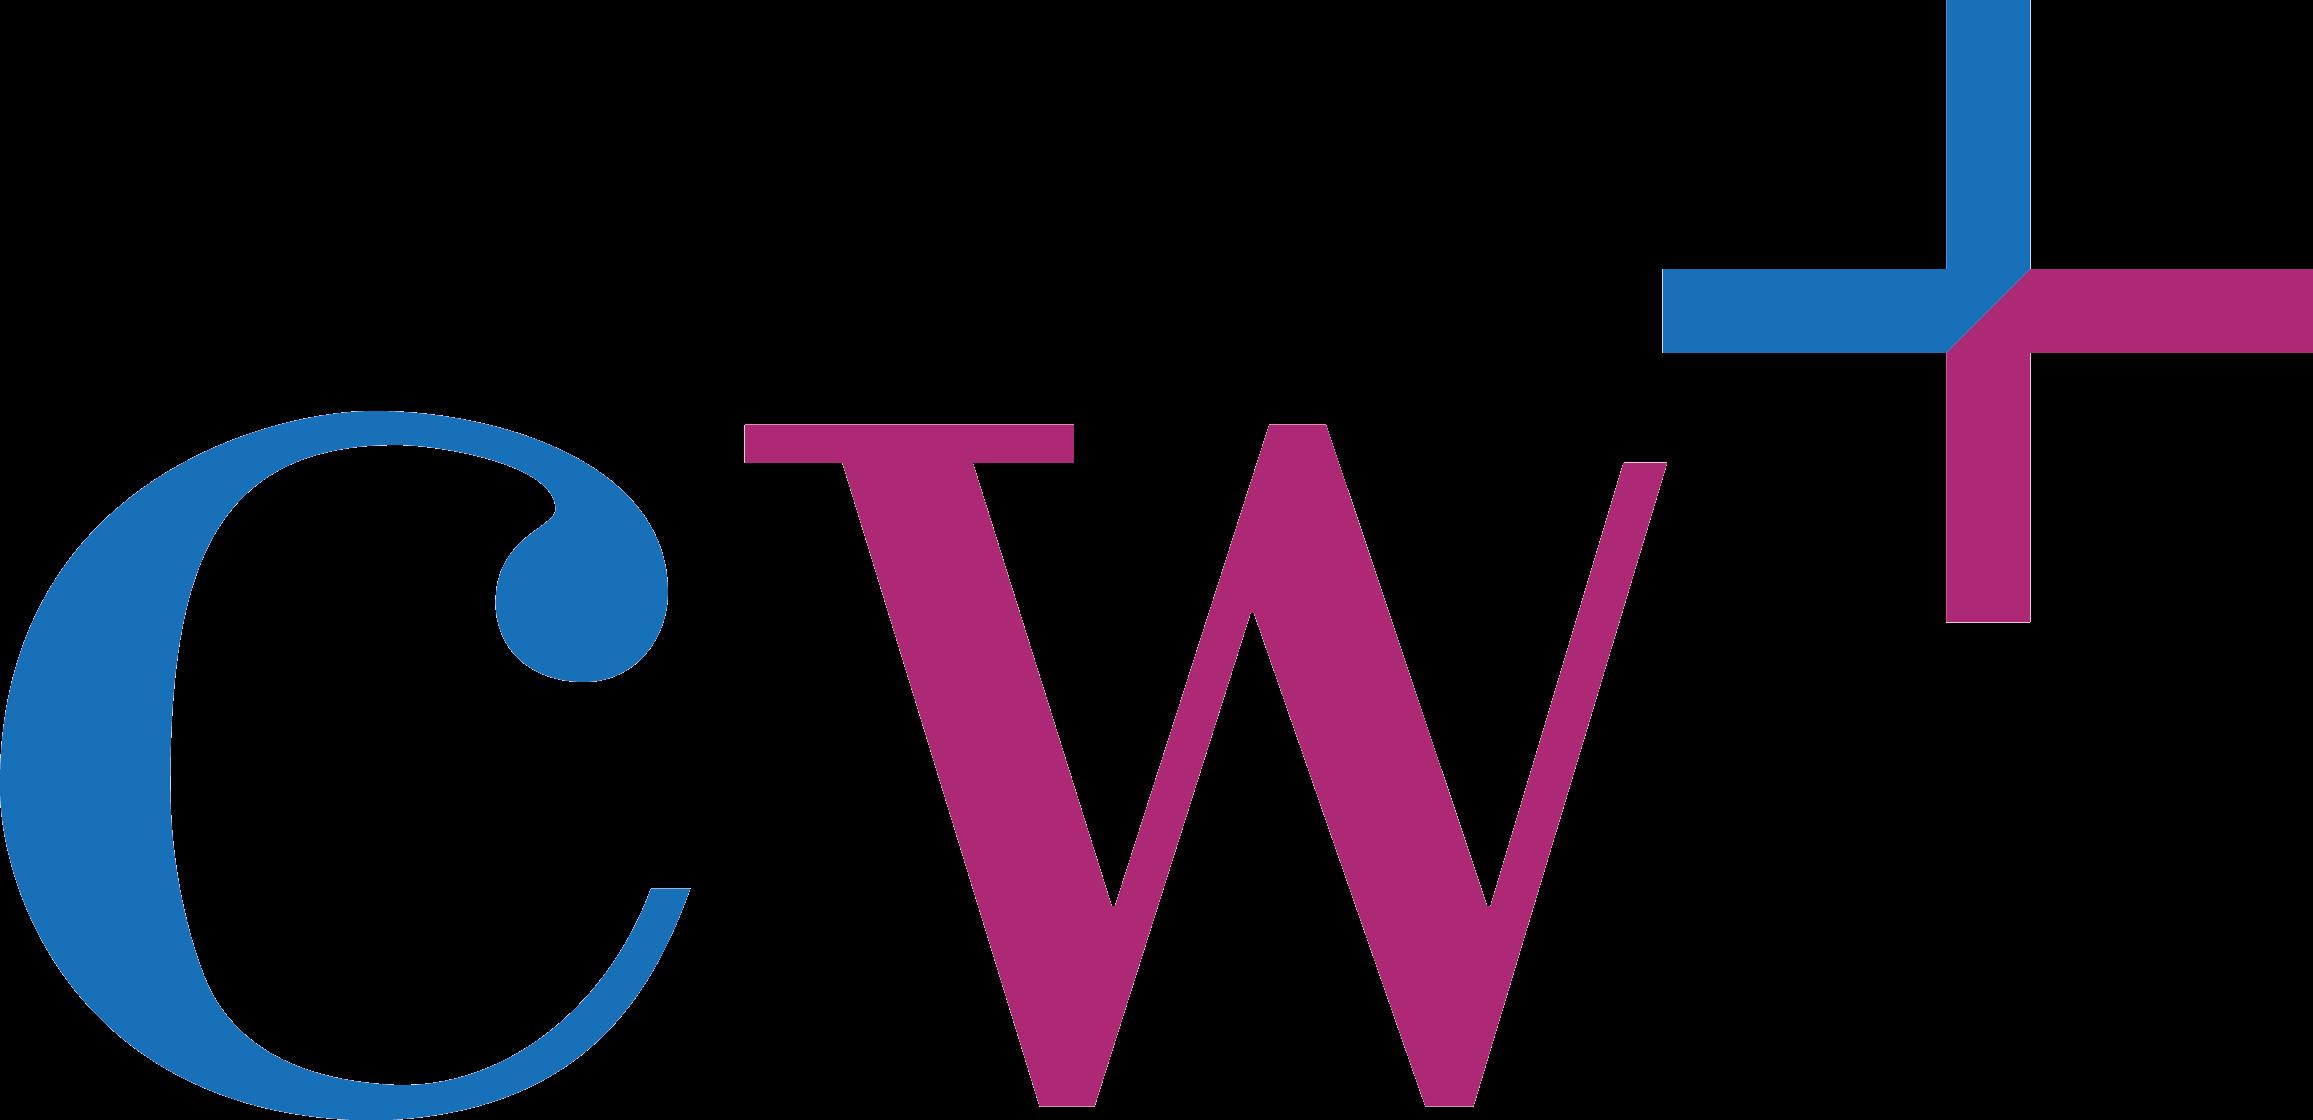 Chelwest logo.png